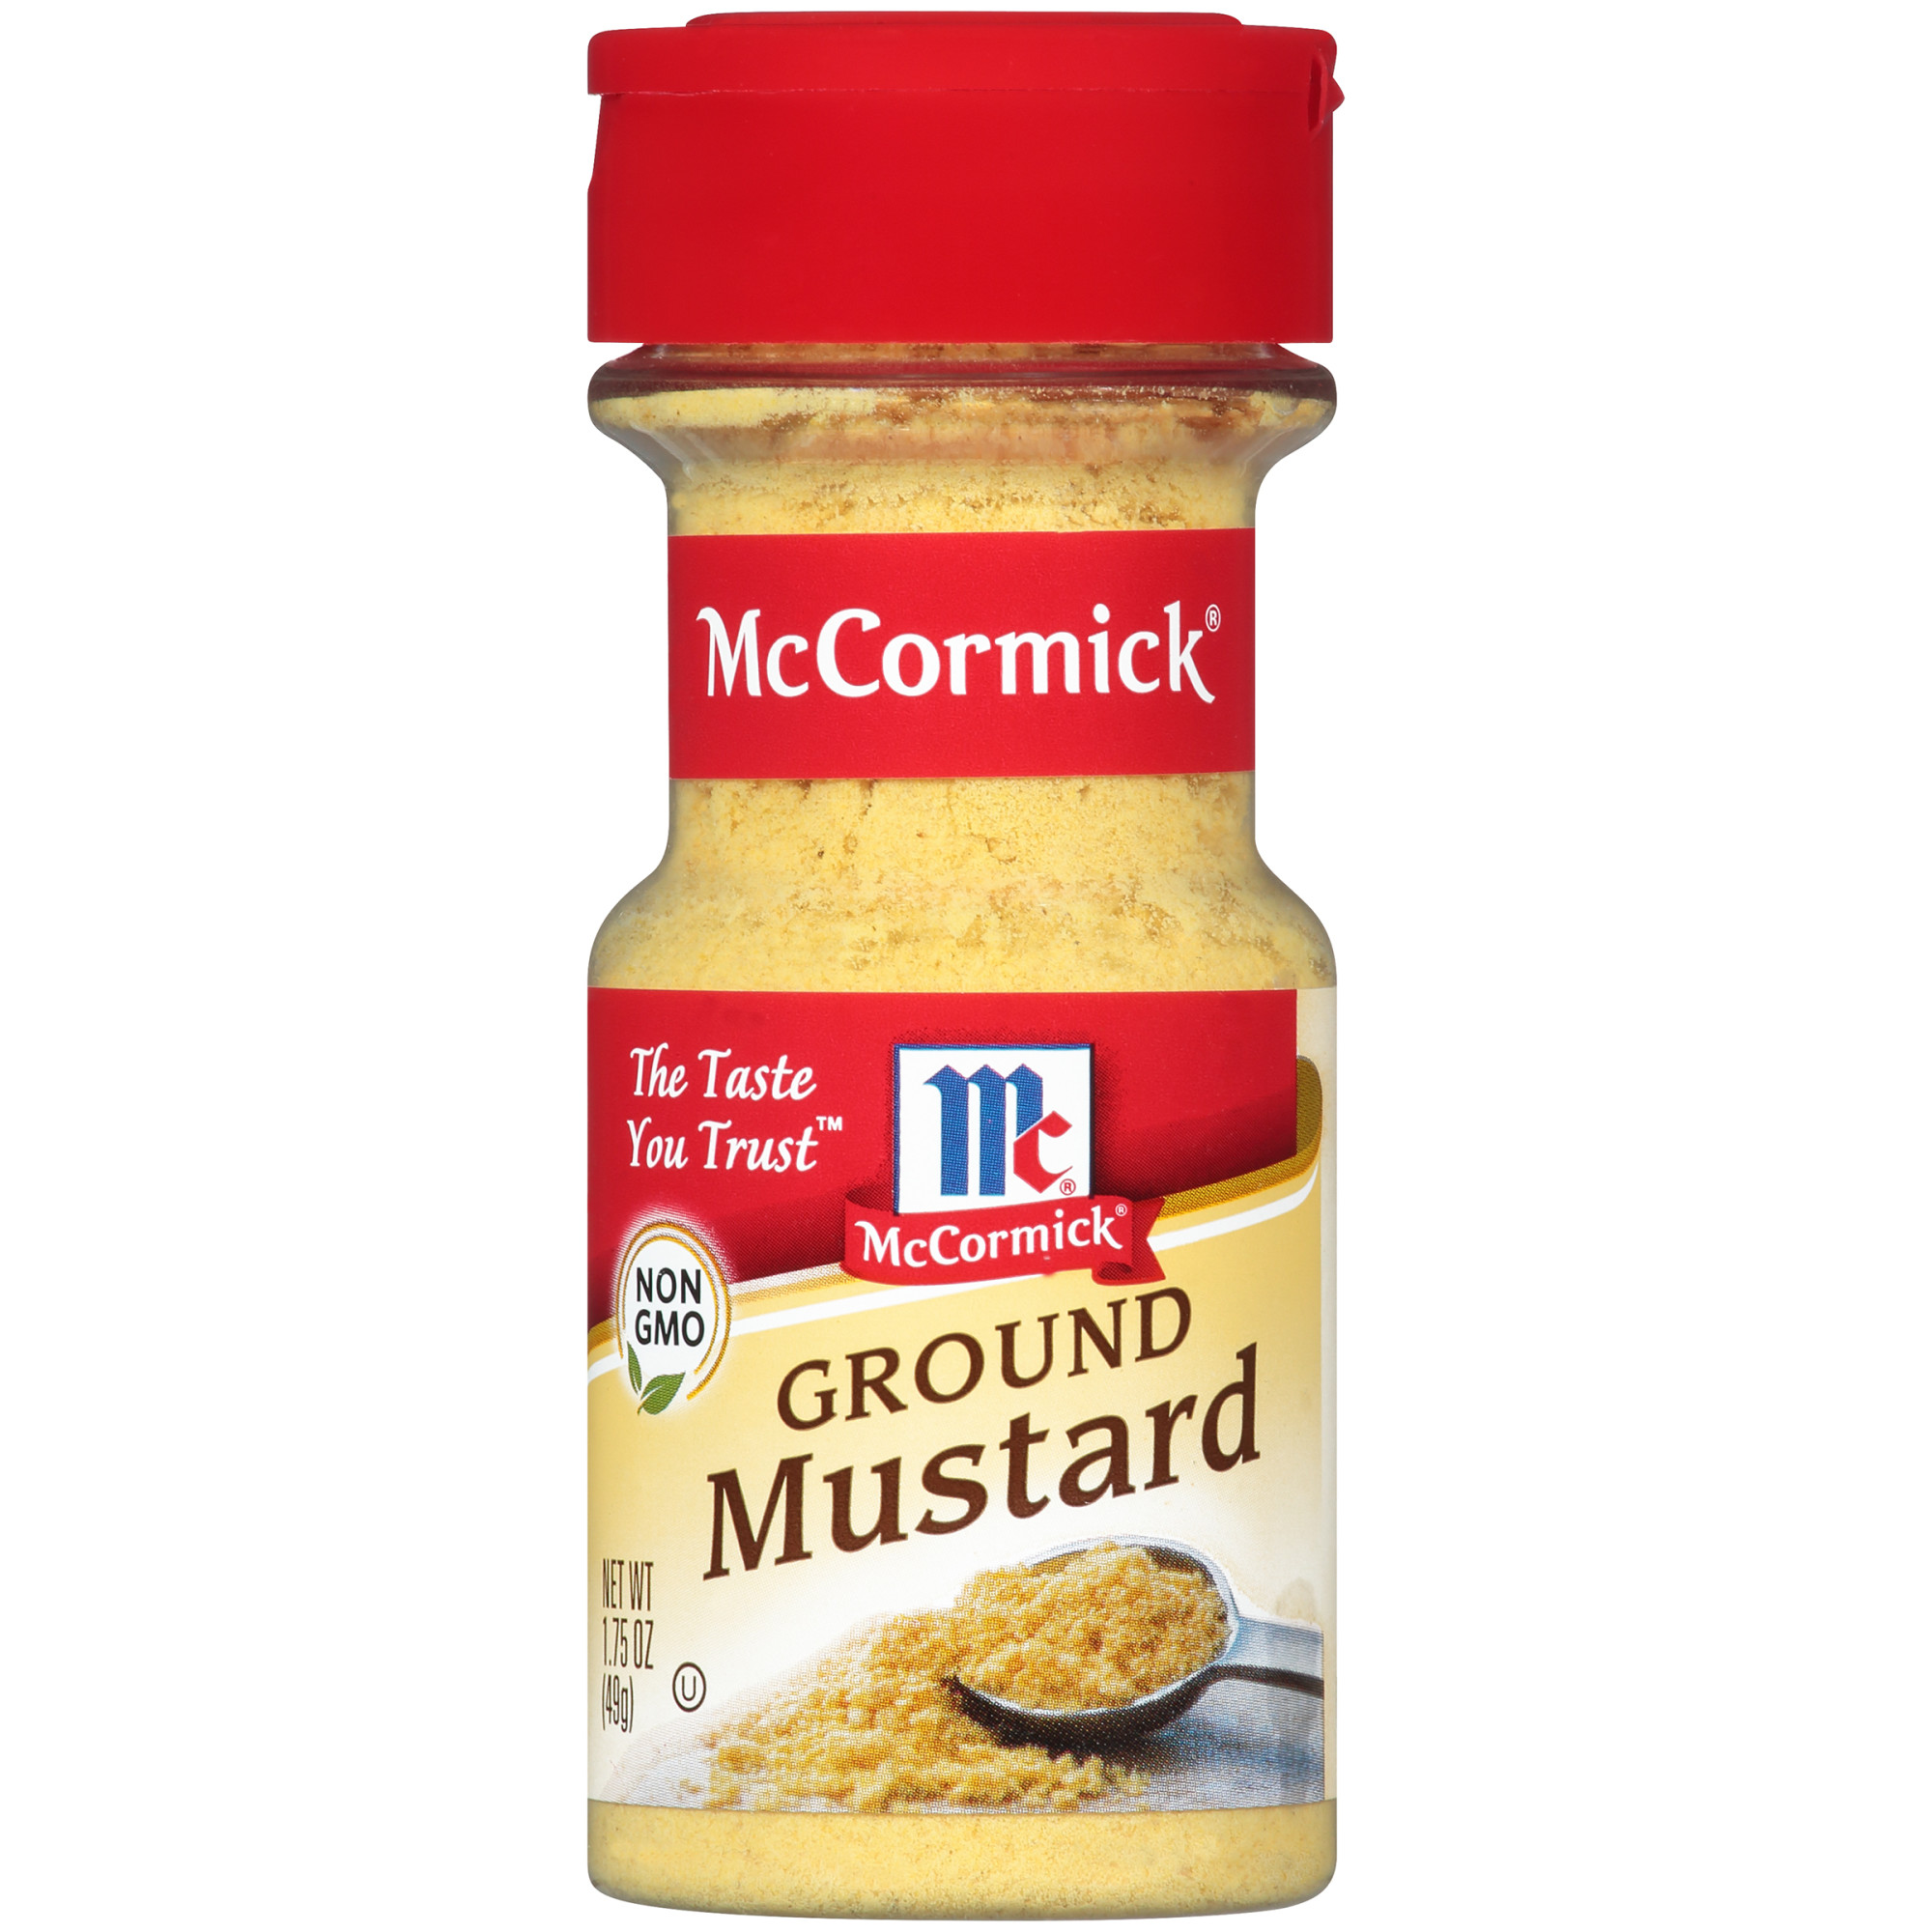 (2 Pack) McCormick Ground Mustard, 1.75 oz